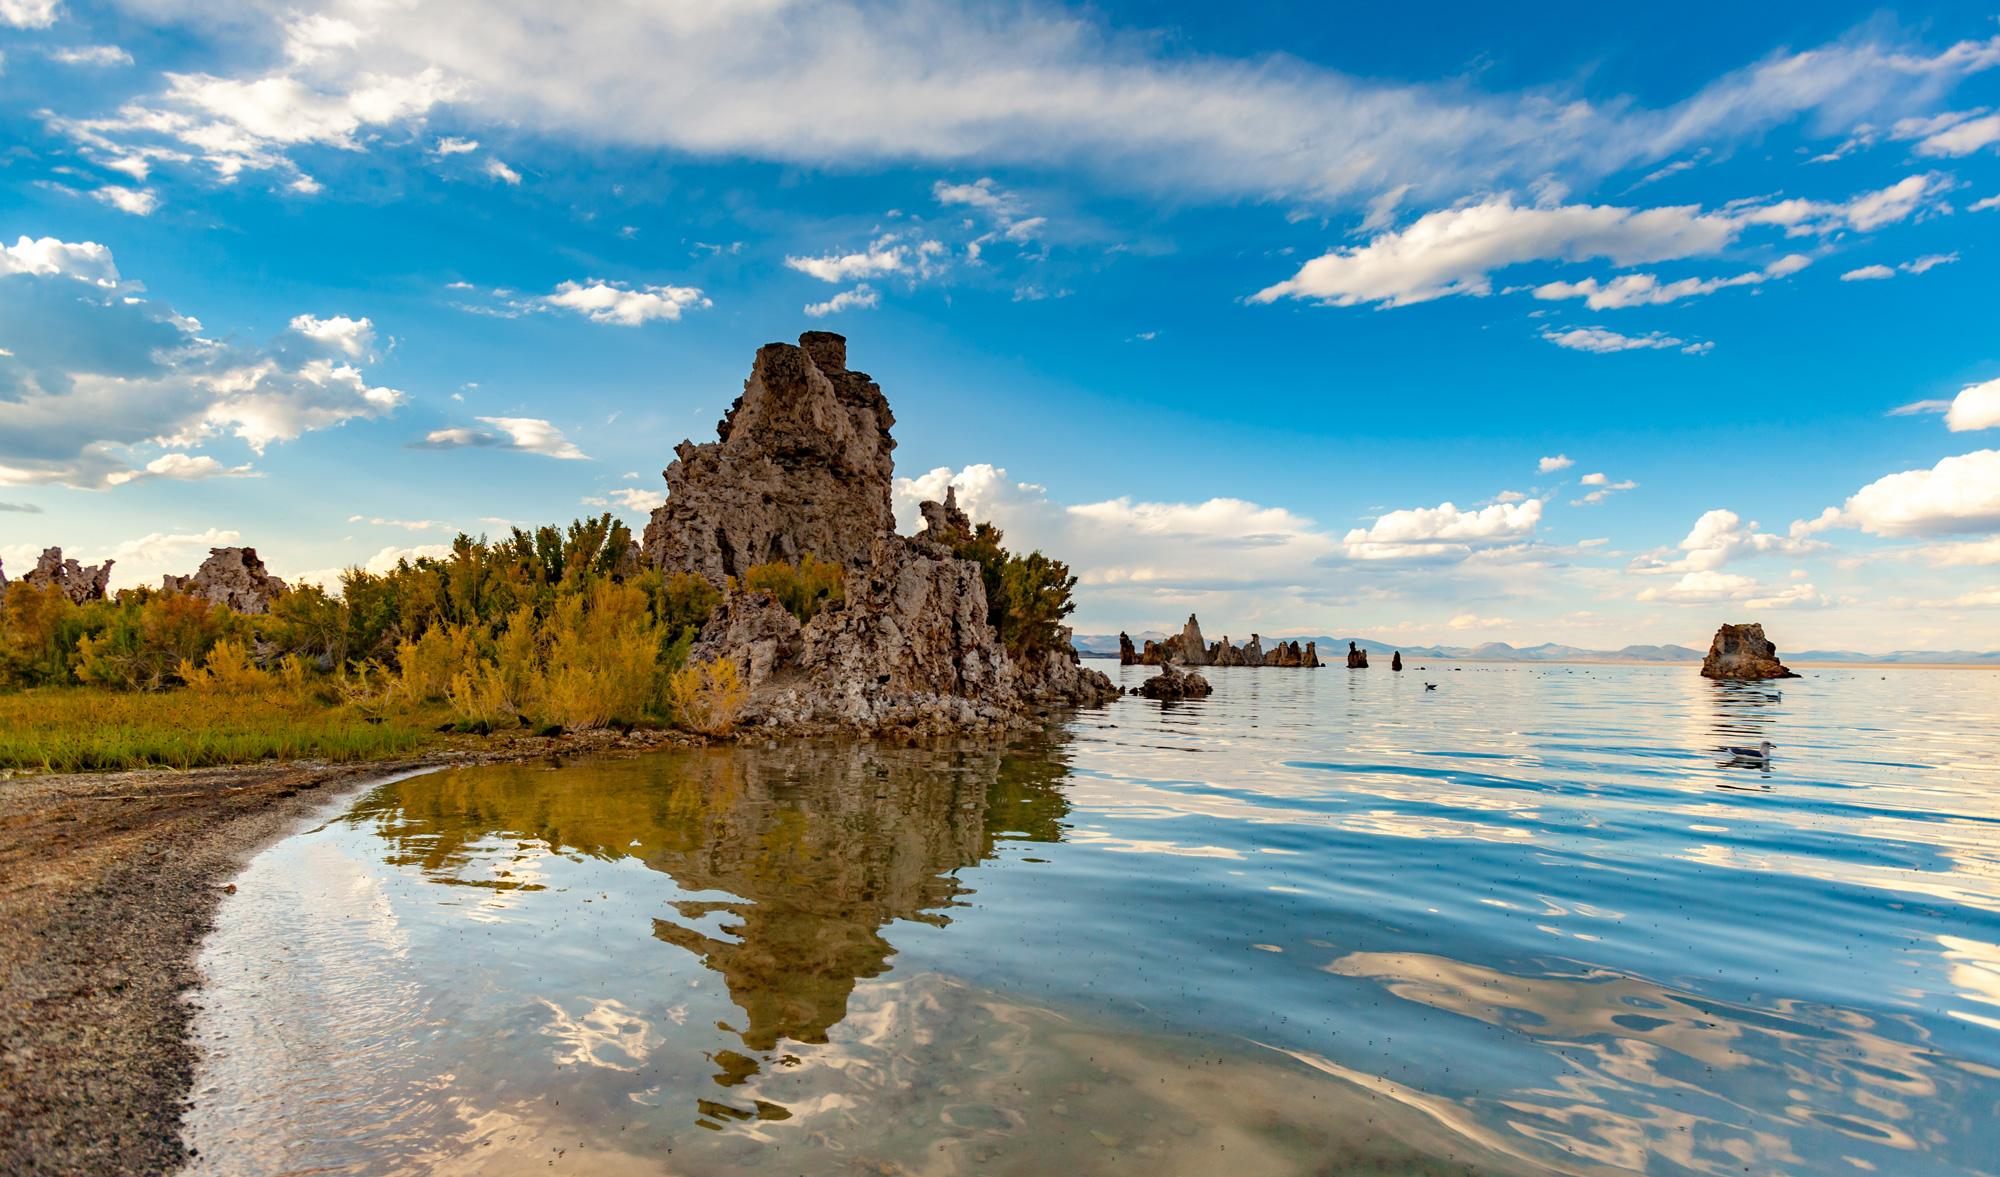 Mono Lake in California, USA